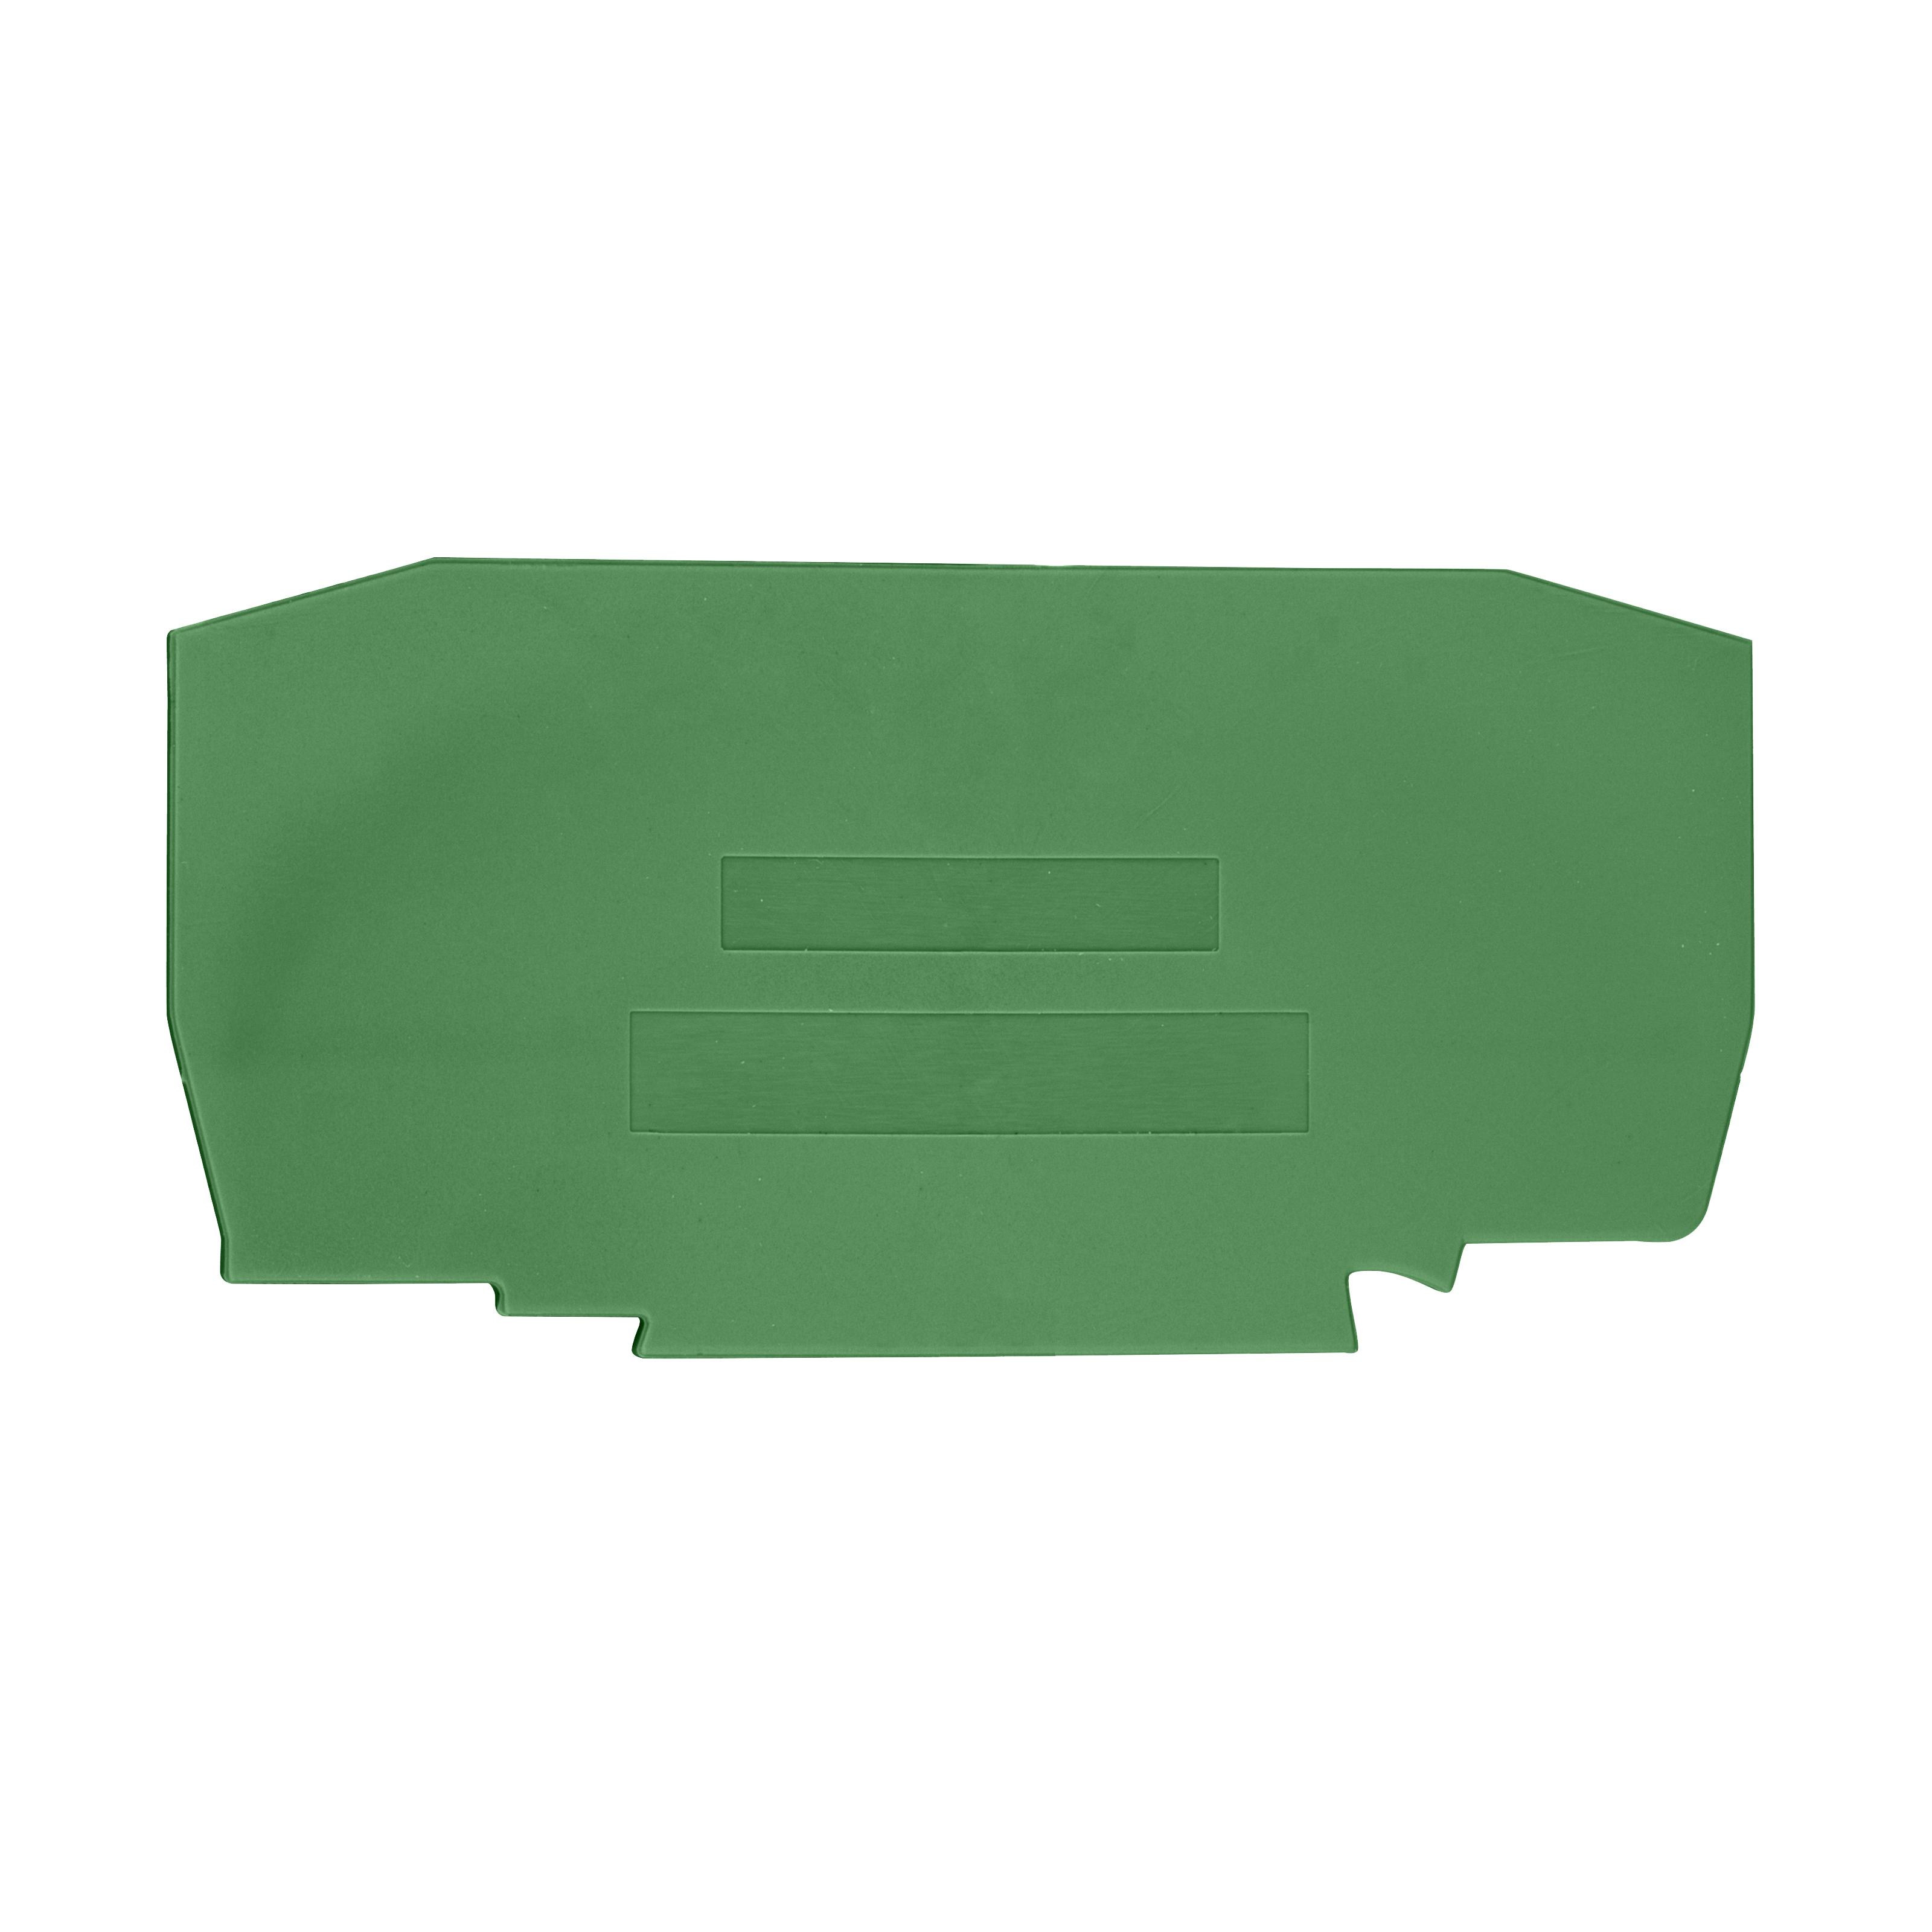 1 Stk Endplatte für Federkraftklemme YBK 10 T grün IK632210--